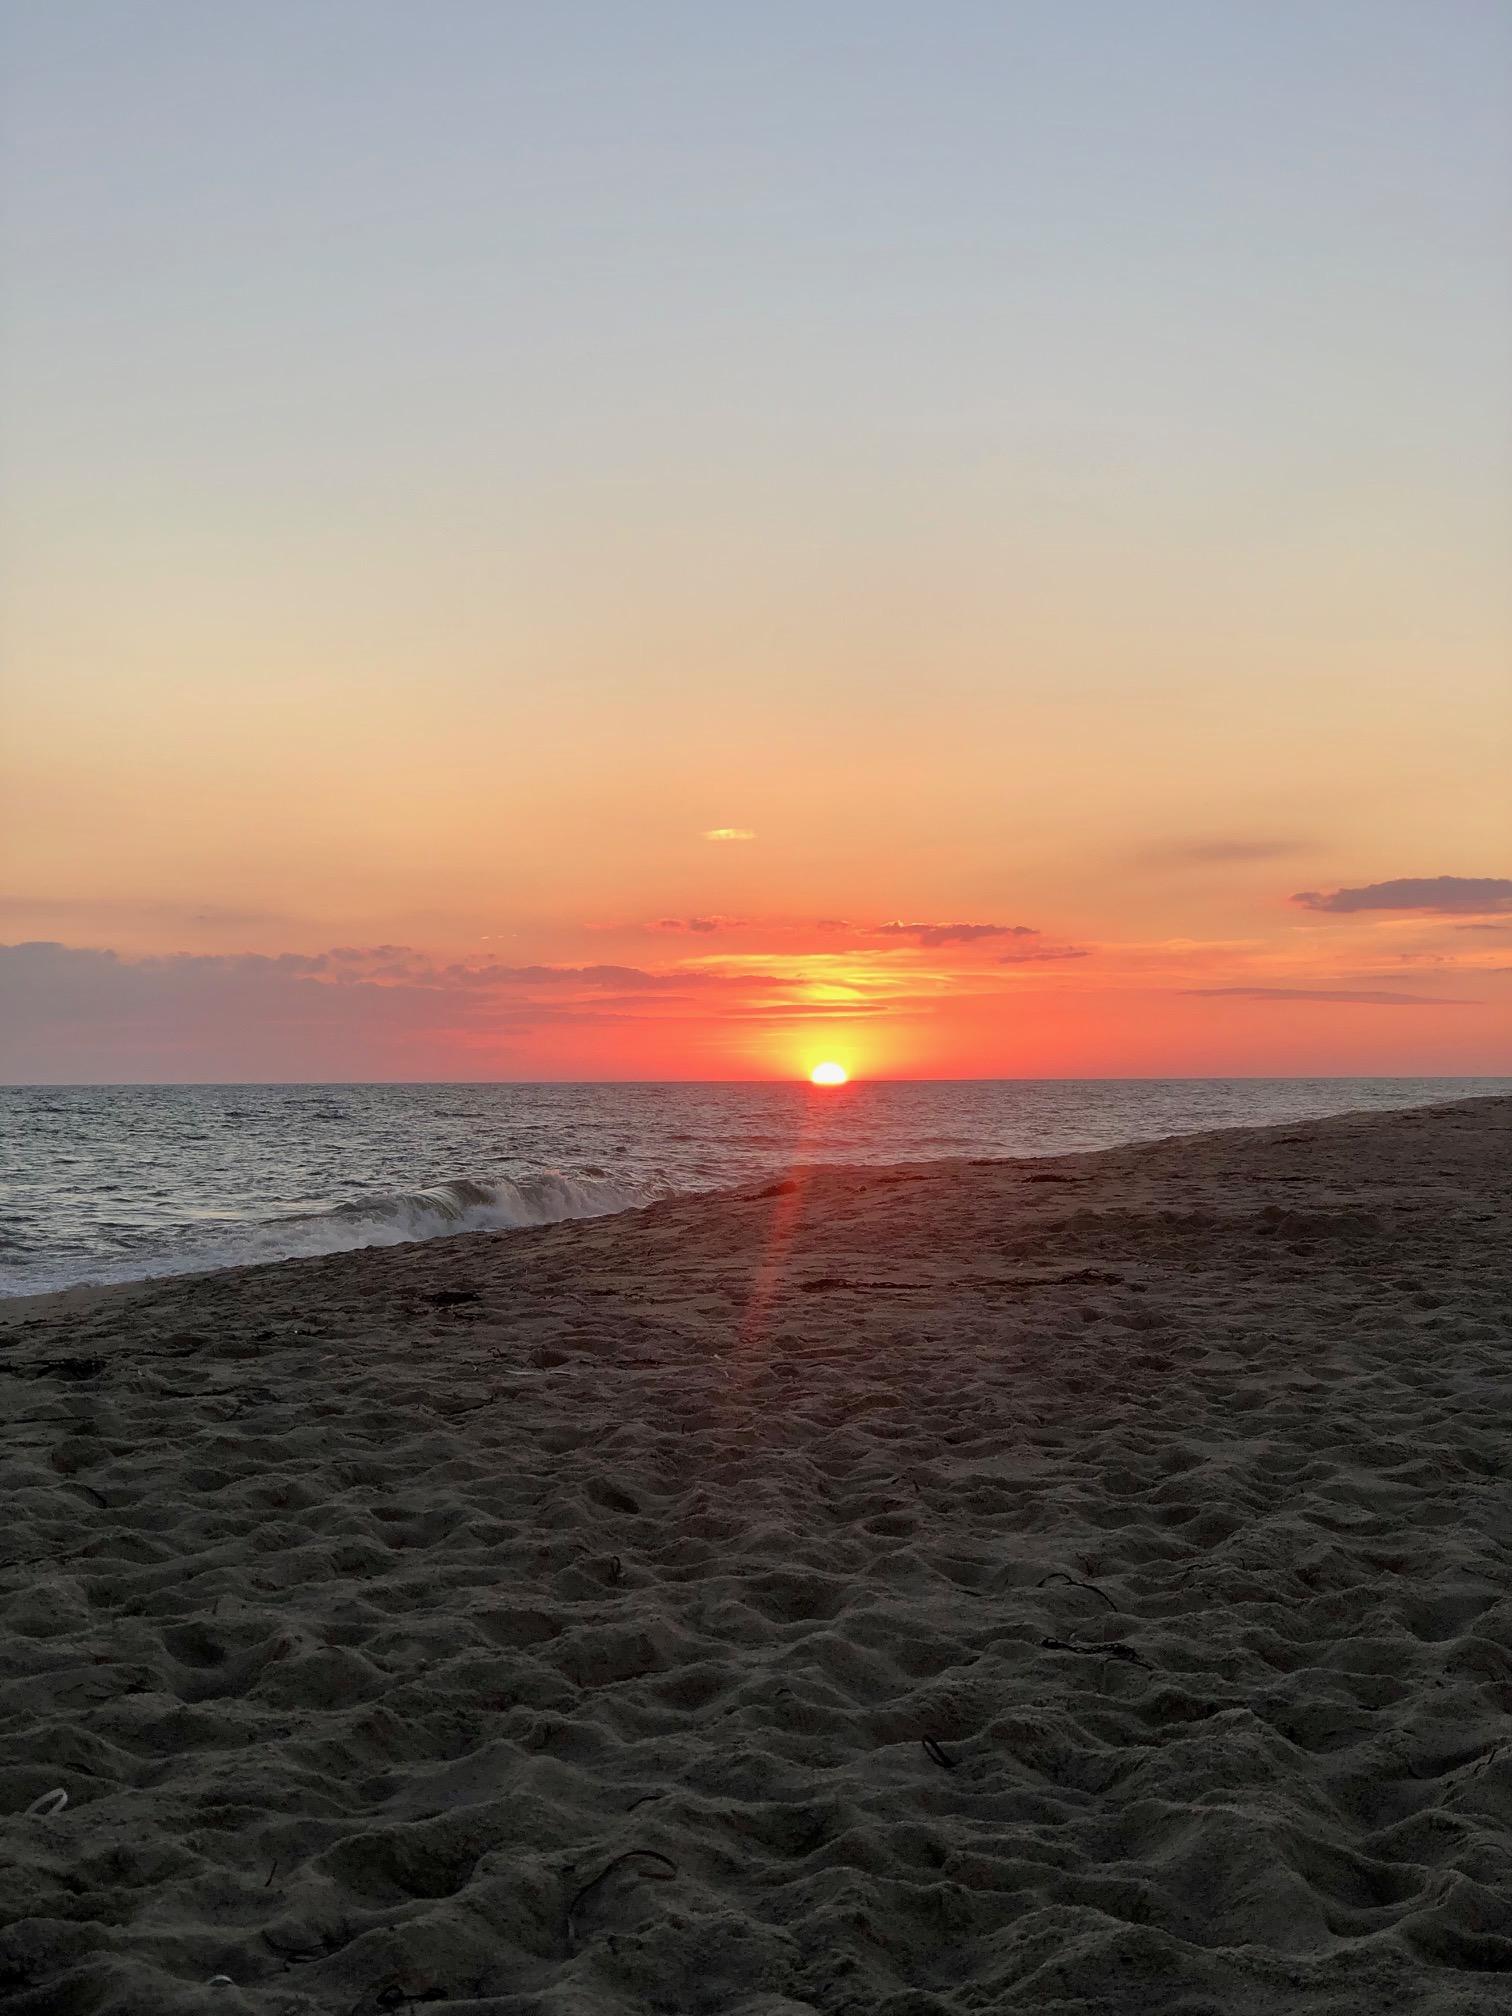 madaket beach, the-alyst.com